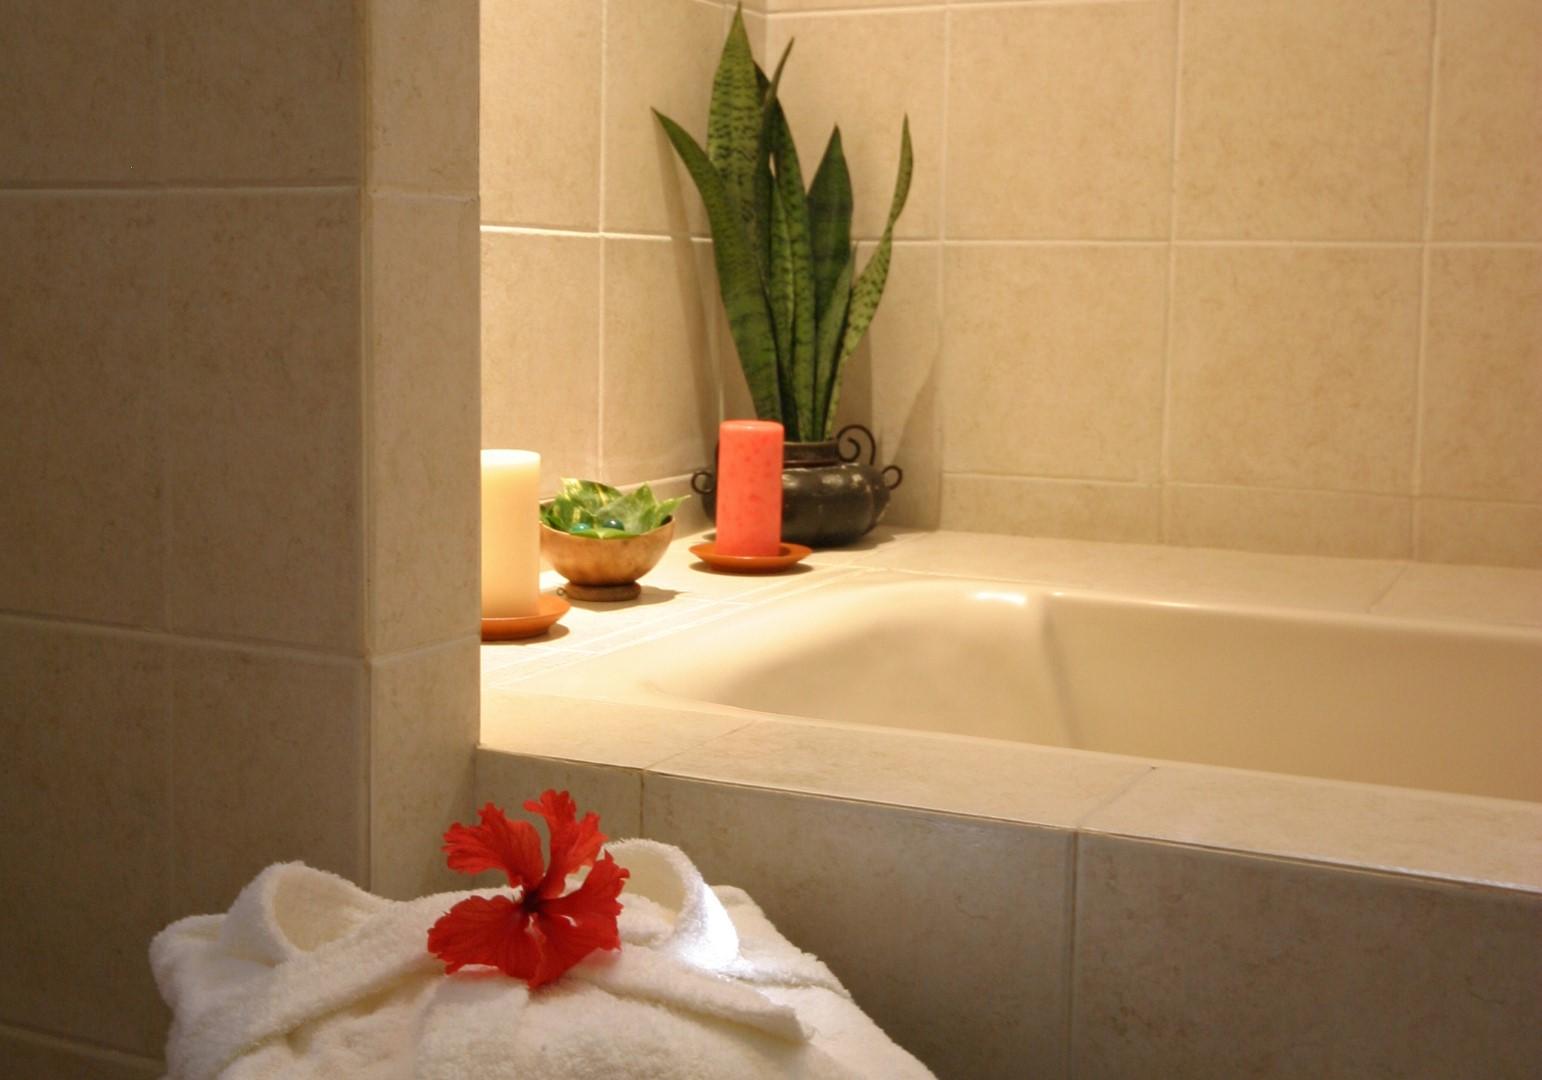 Bathroom at Hacienda Chichen Itza